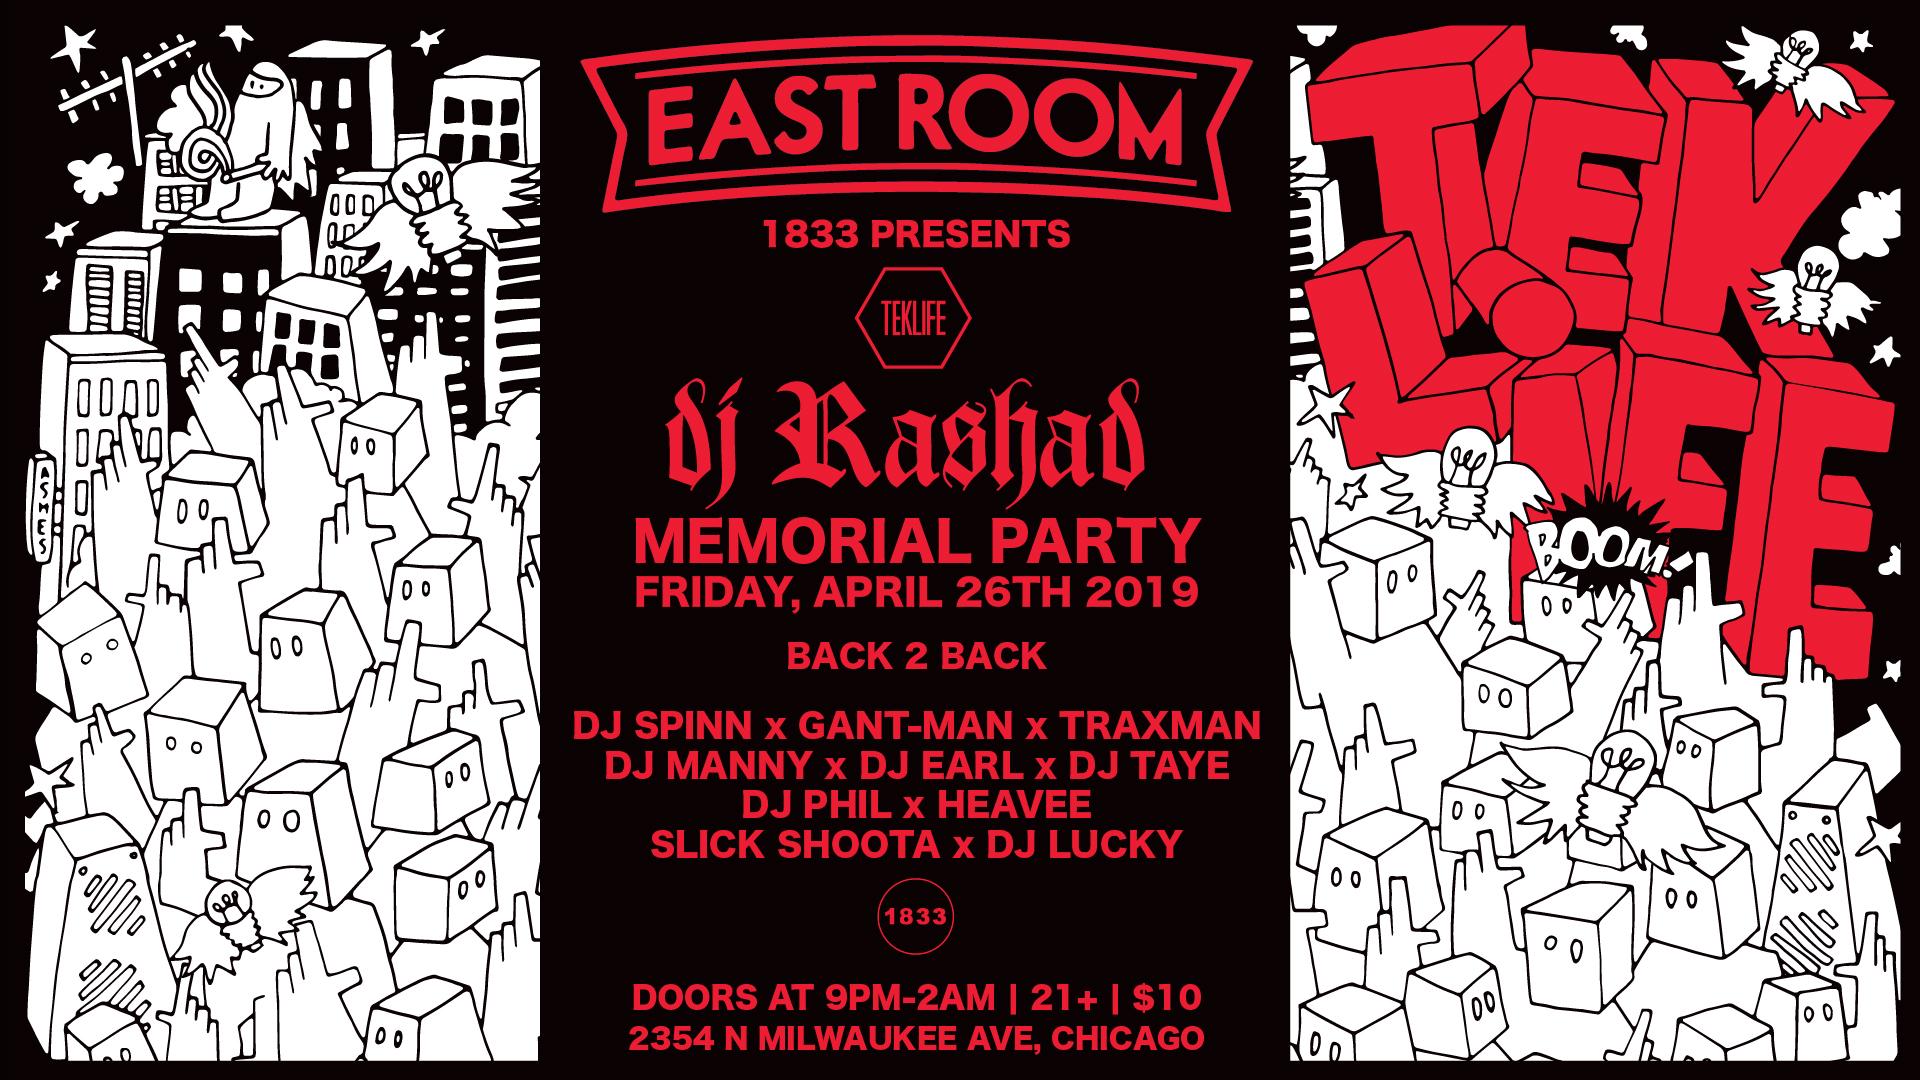 DJ RASHAD MEMORIAL PARTY